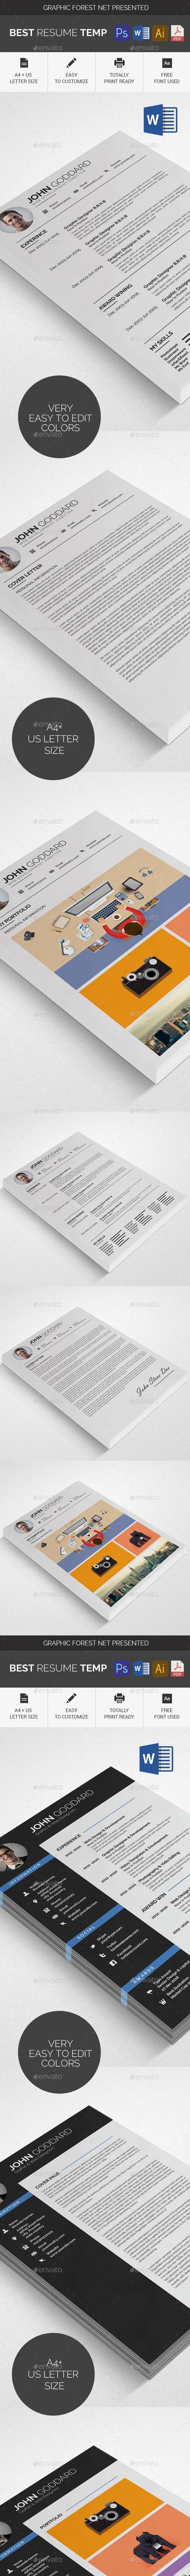 Clean Resume/CV Bundle - Resumes Stationery